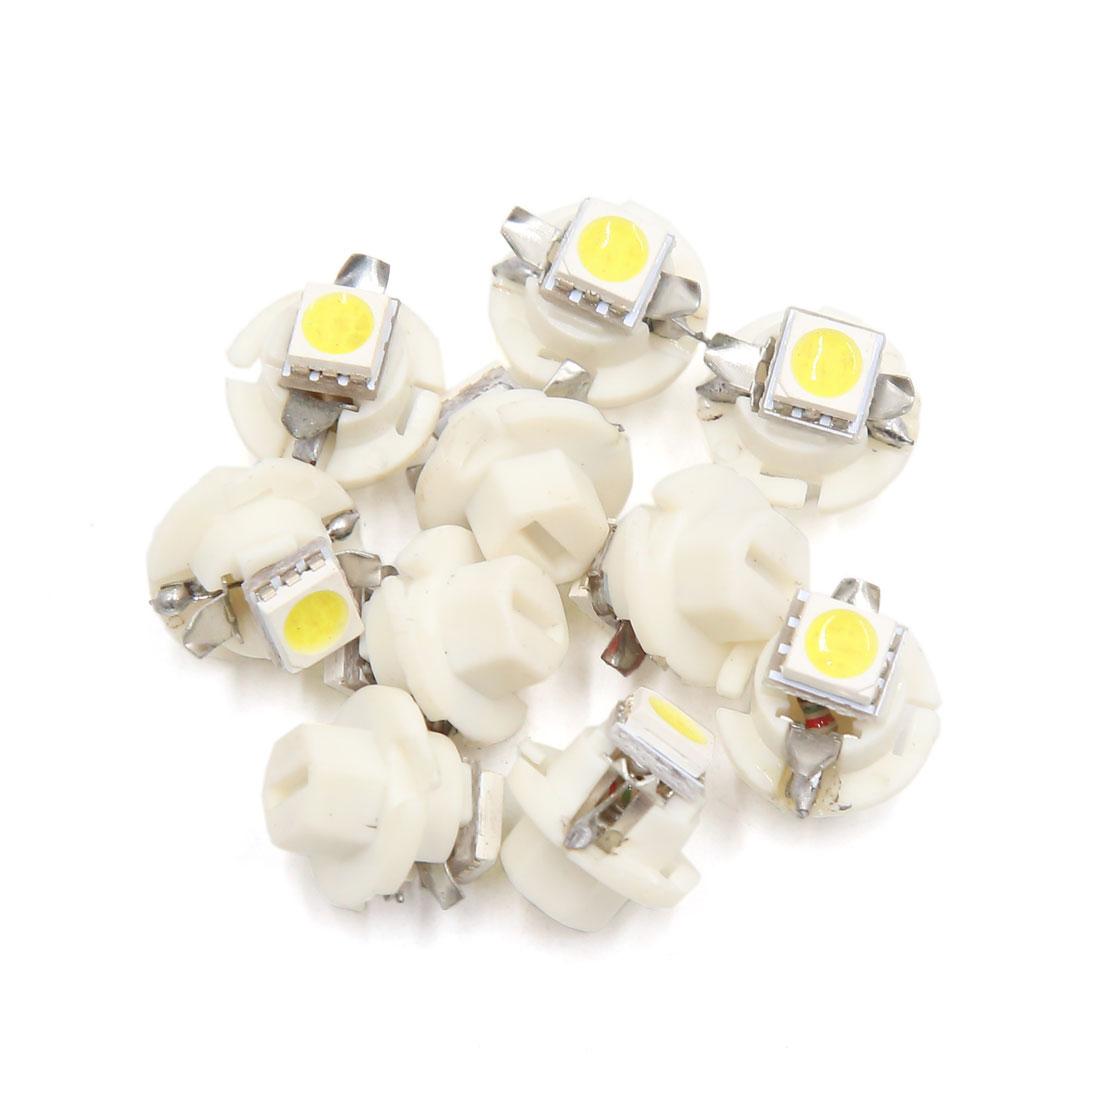 10 Pcs B8.4 White 5050  Auto Car Interior Dashboard Dash Gauge Lights Bulb